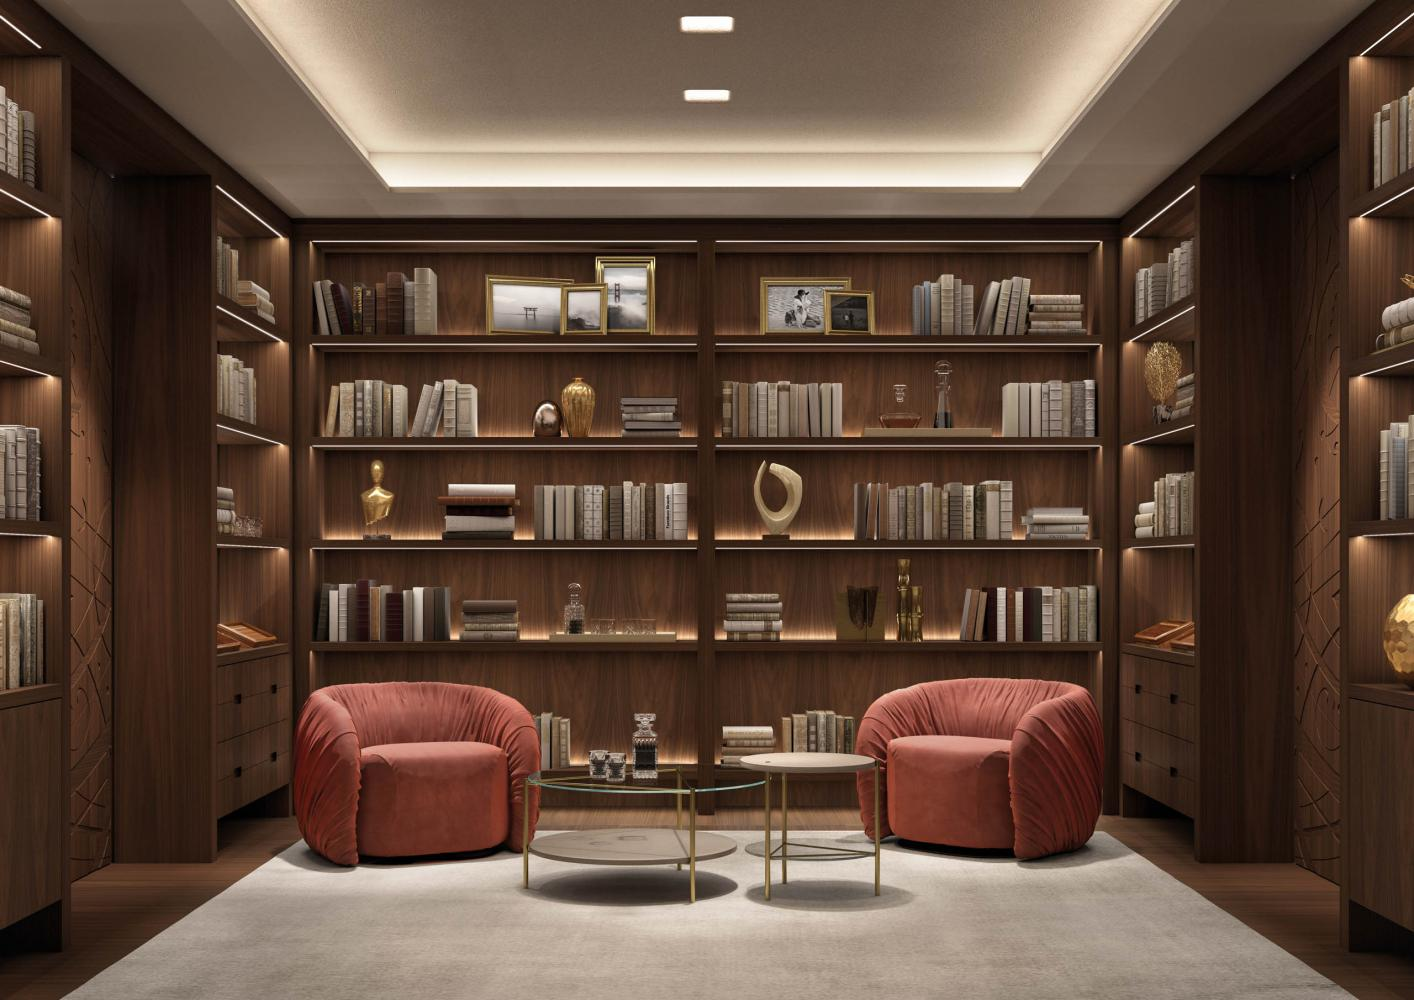 laurameroni graffiti day system in wood for luxury livingroom interior design